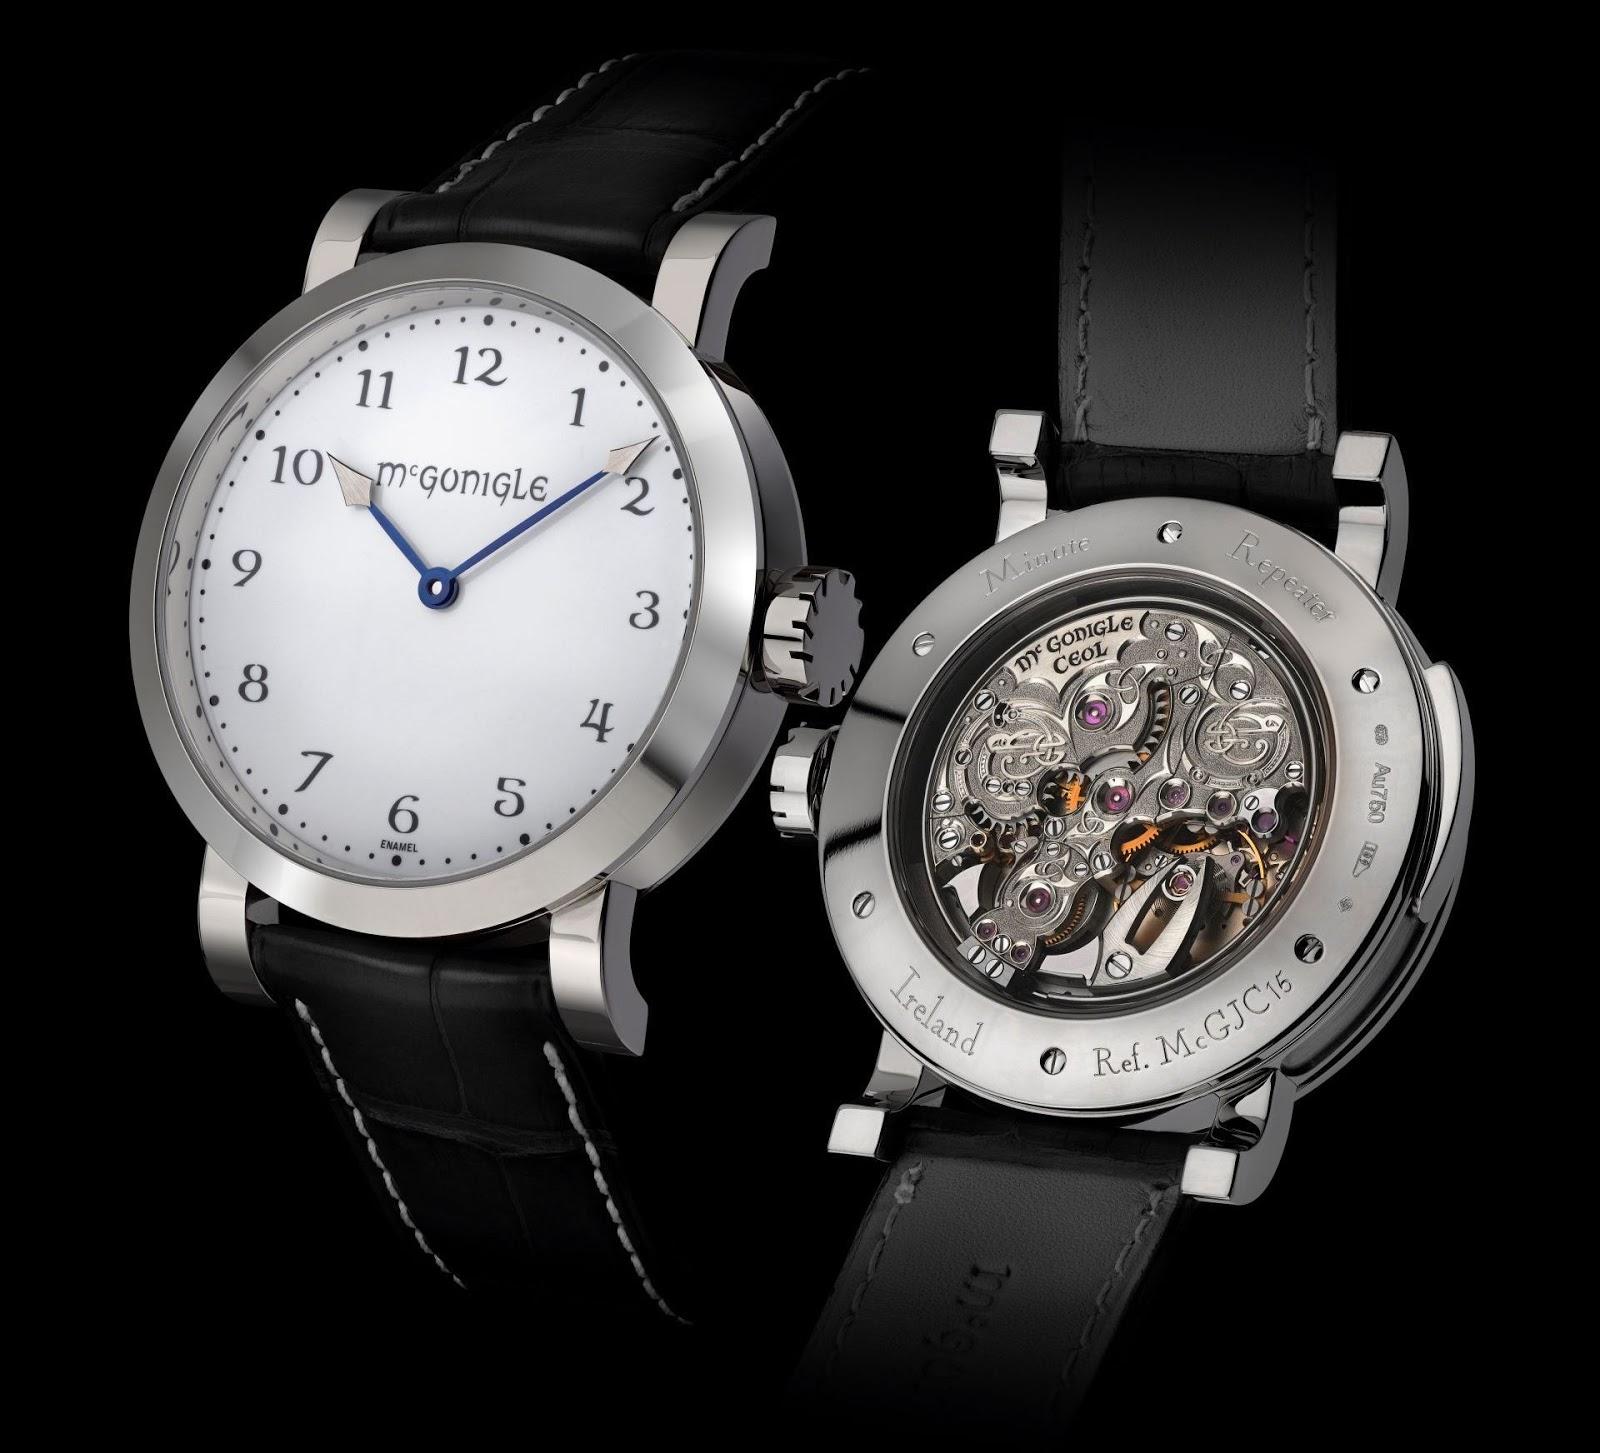 Mcgonigle watches - 1